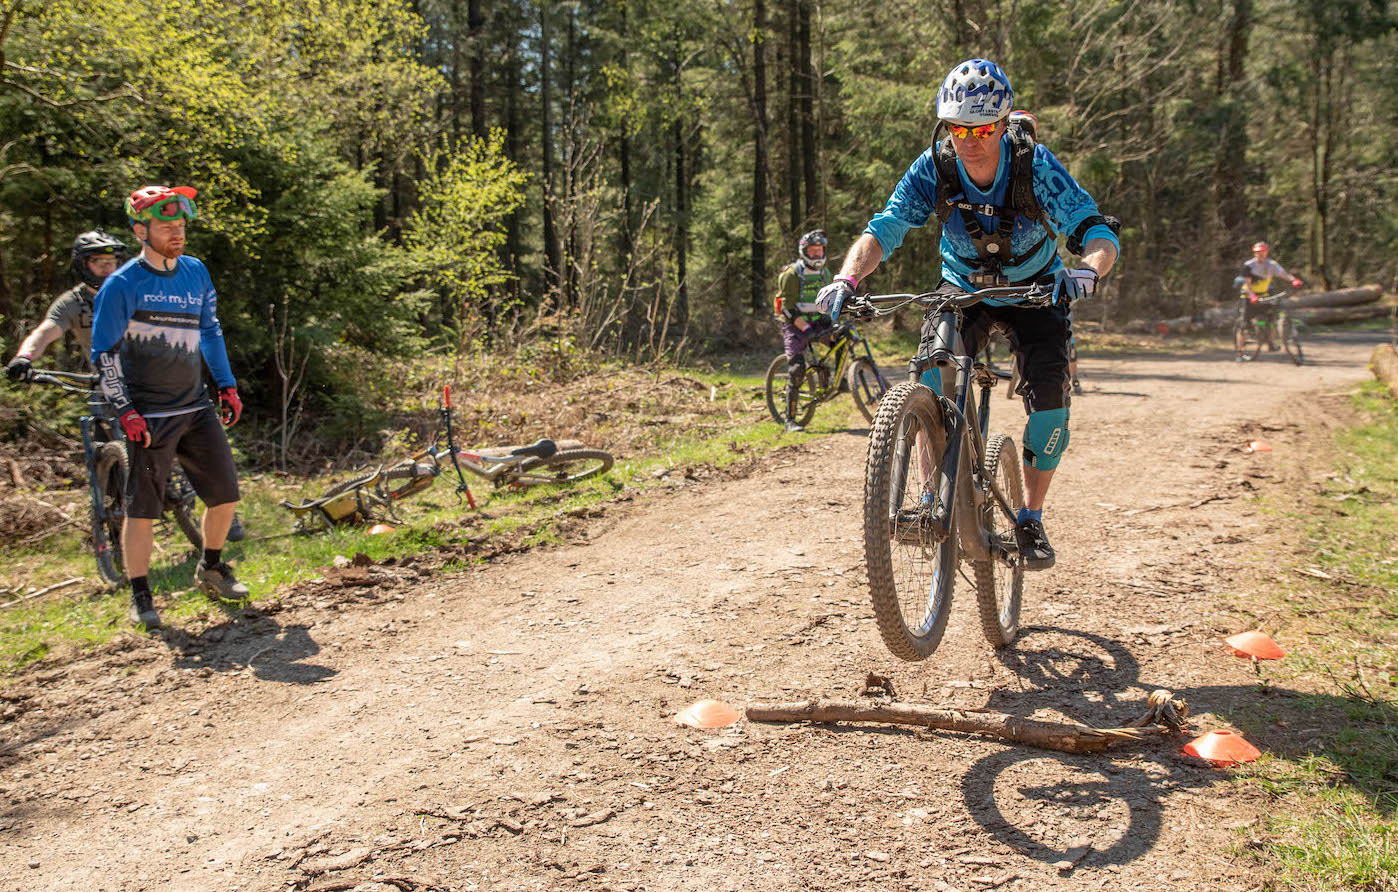 MTB Sprung & Drop Kurs im Trailpark Erbeskopf - Fahrtechnik Training Rock my Trail Bikeschule - 16